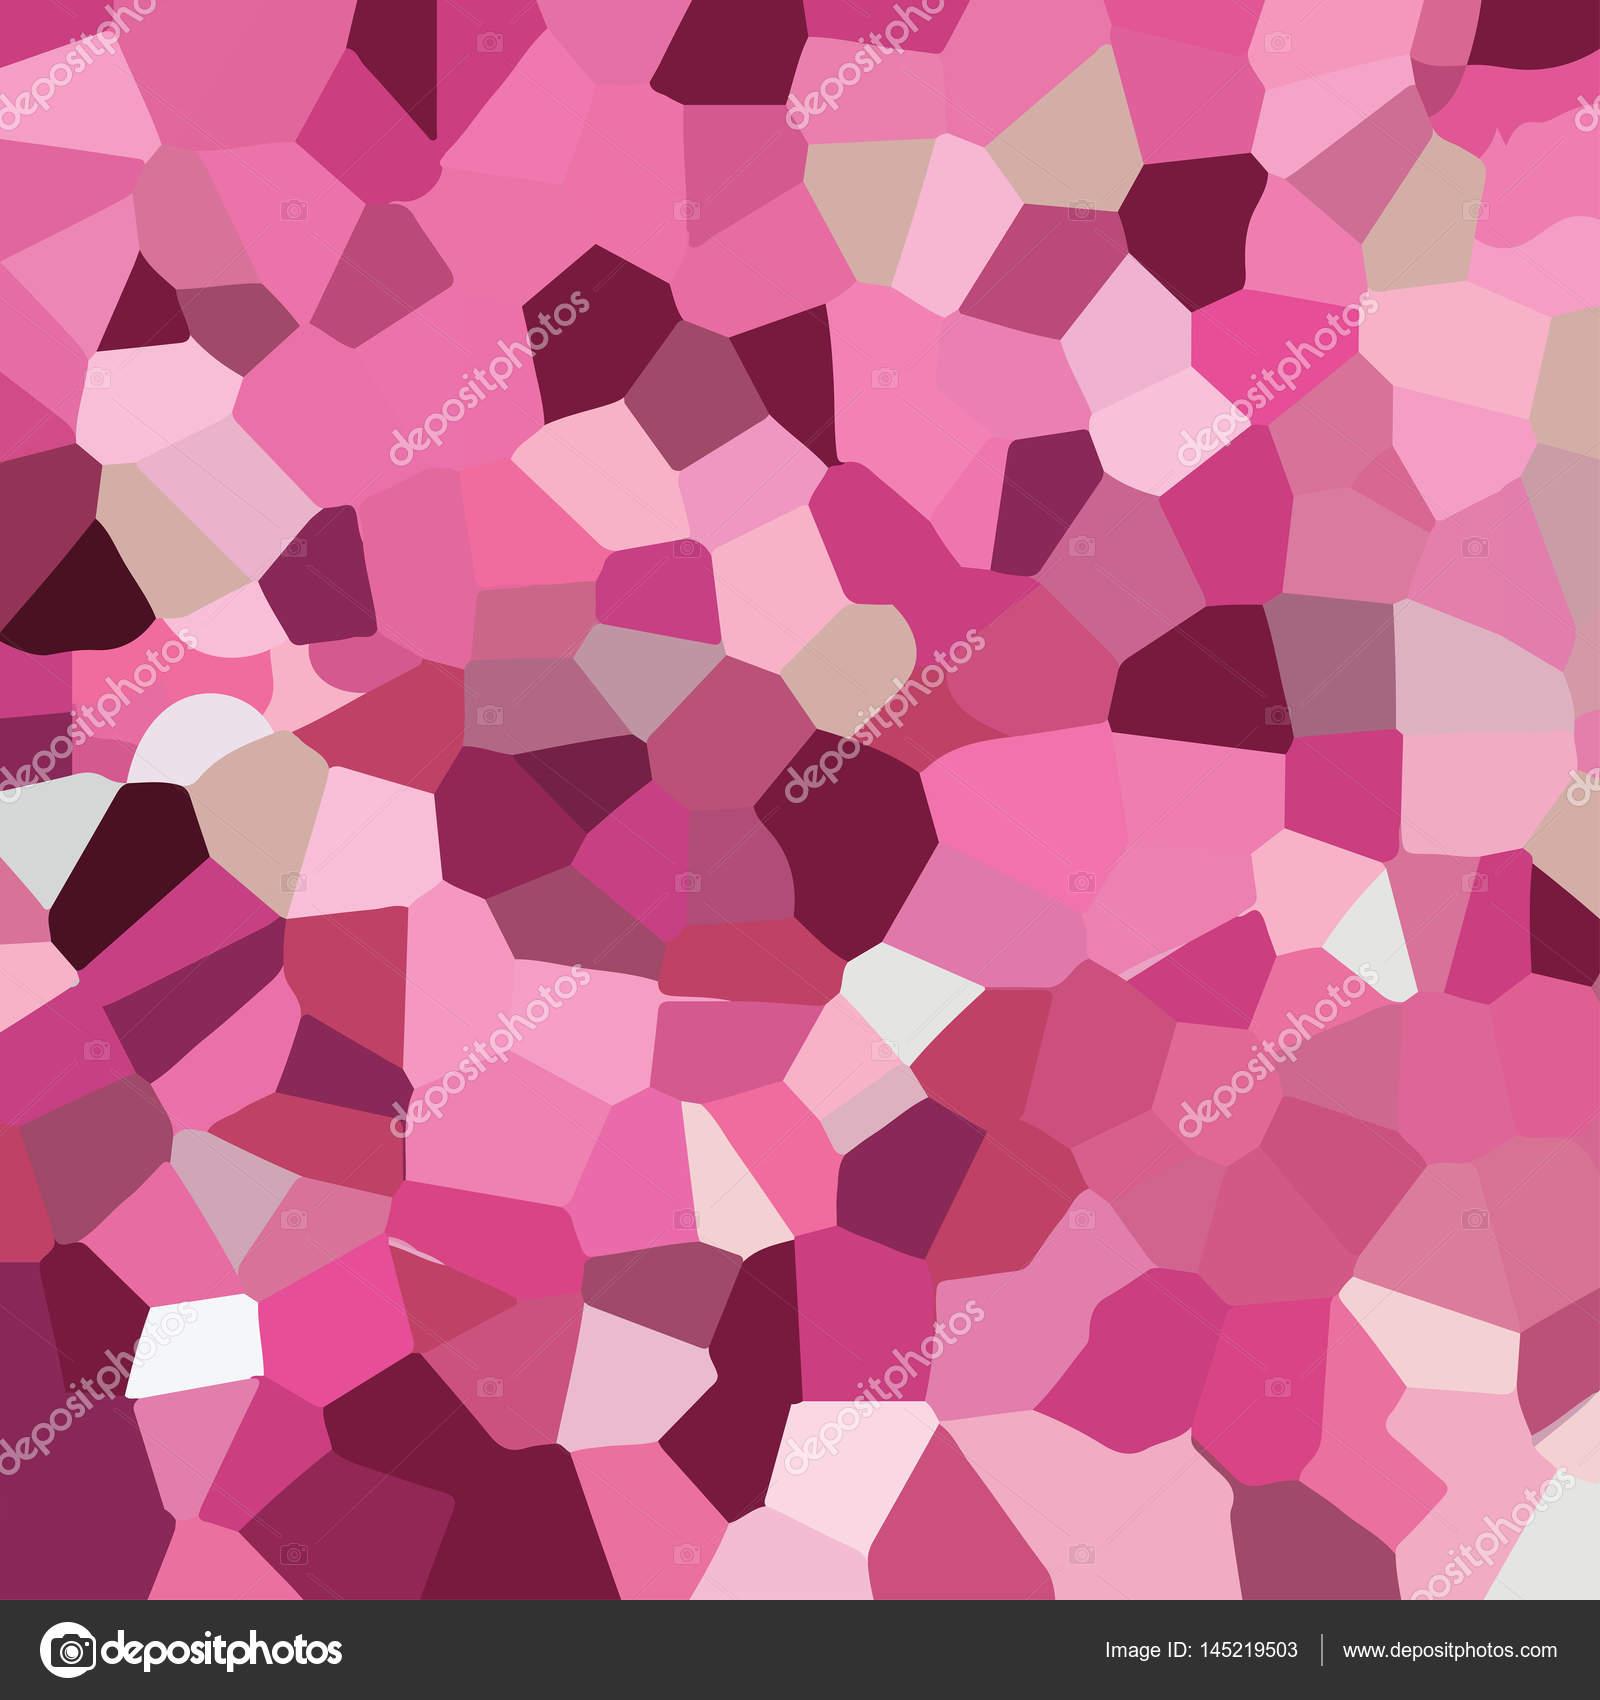 Modern Geometric Seamless Pattern Vector Abstract Mosaic Tiles Texture